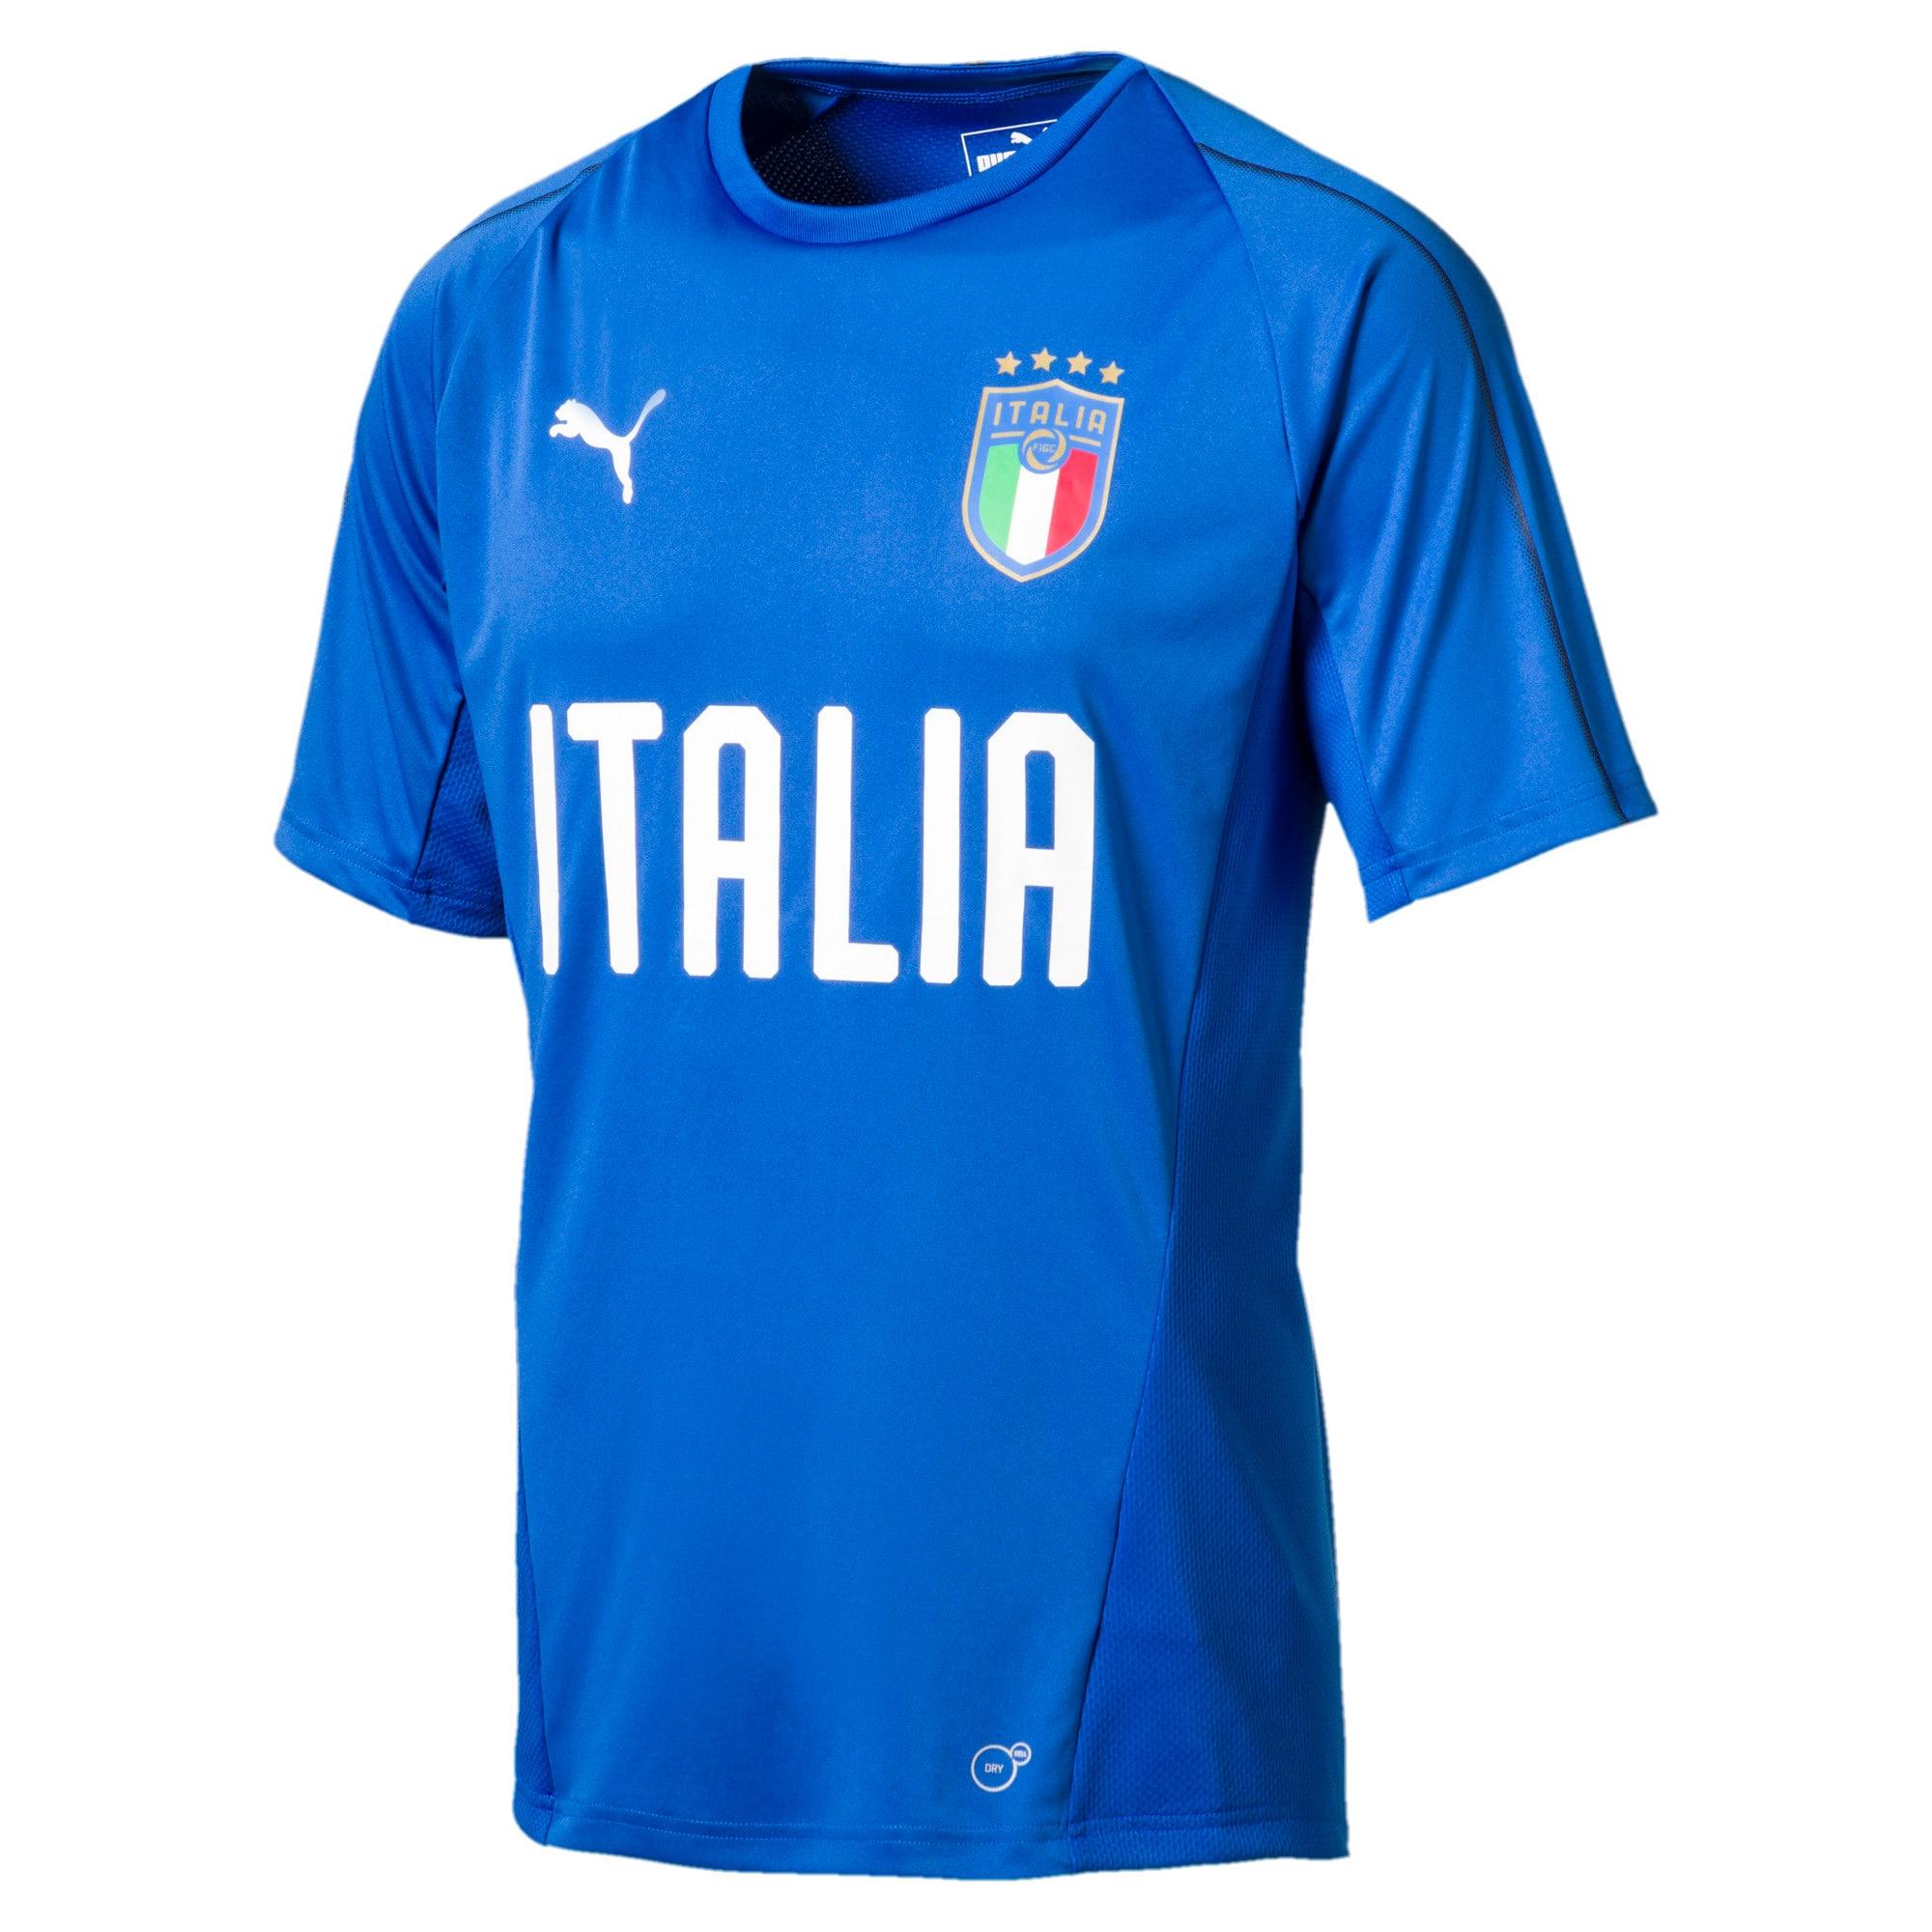 Thumbnail 1 of Italia Training Jersey, Team Power Blue-Puma White, medium